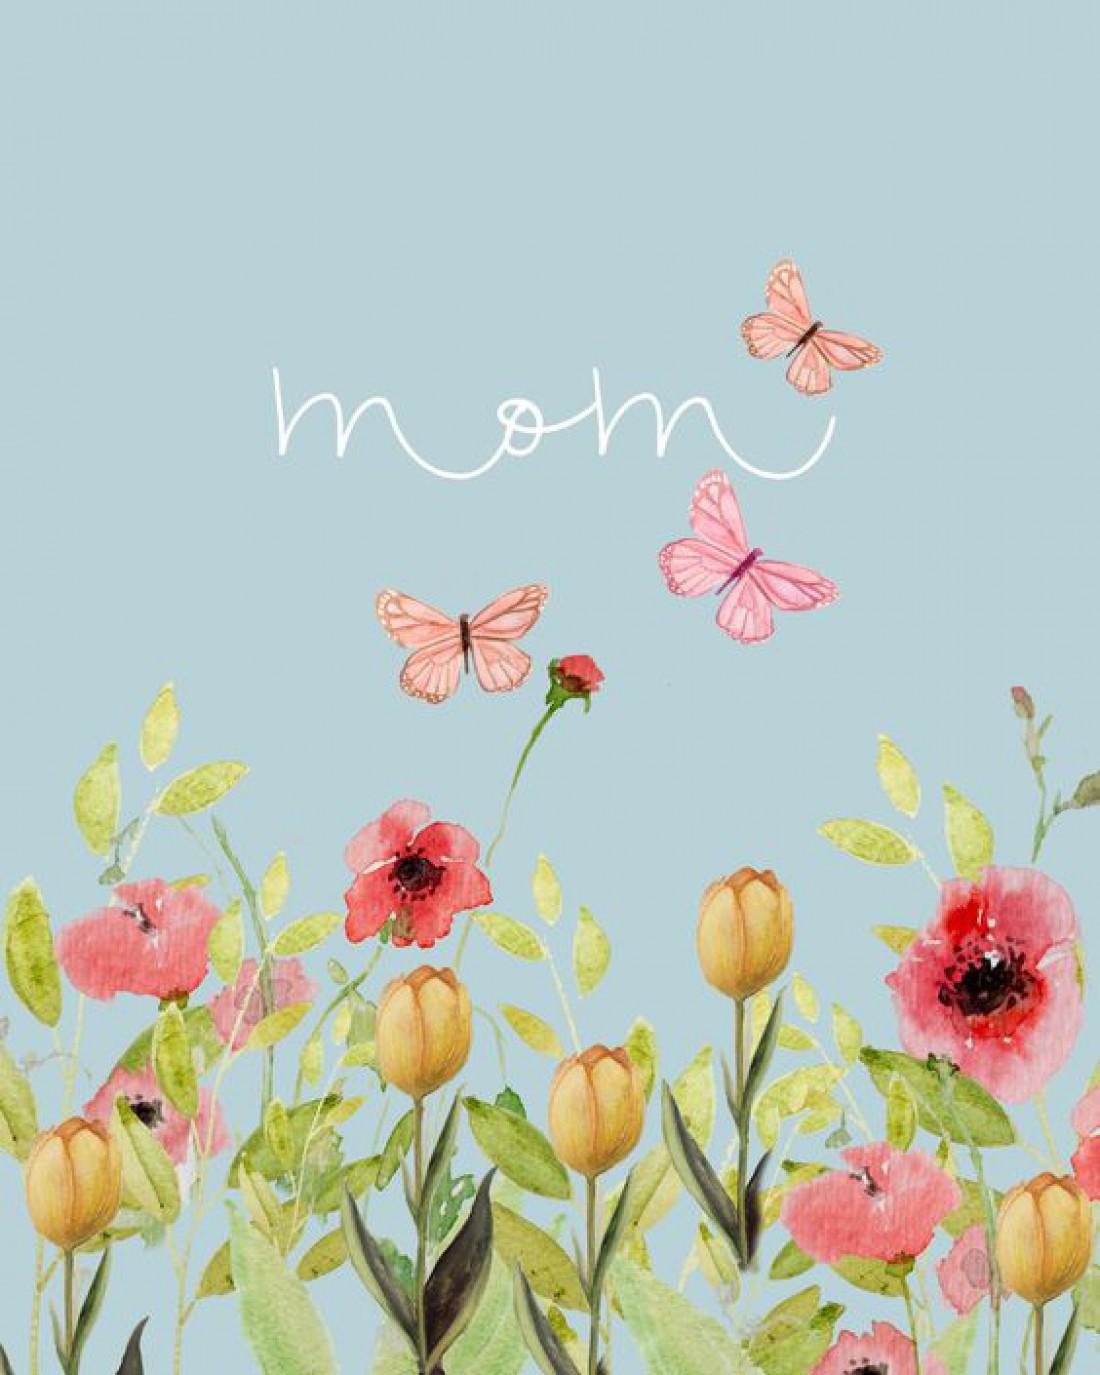 День матери: открытки